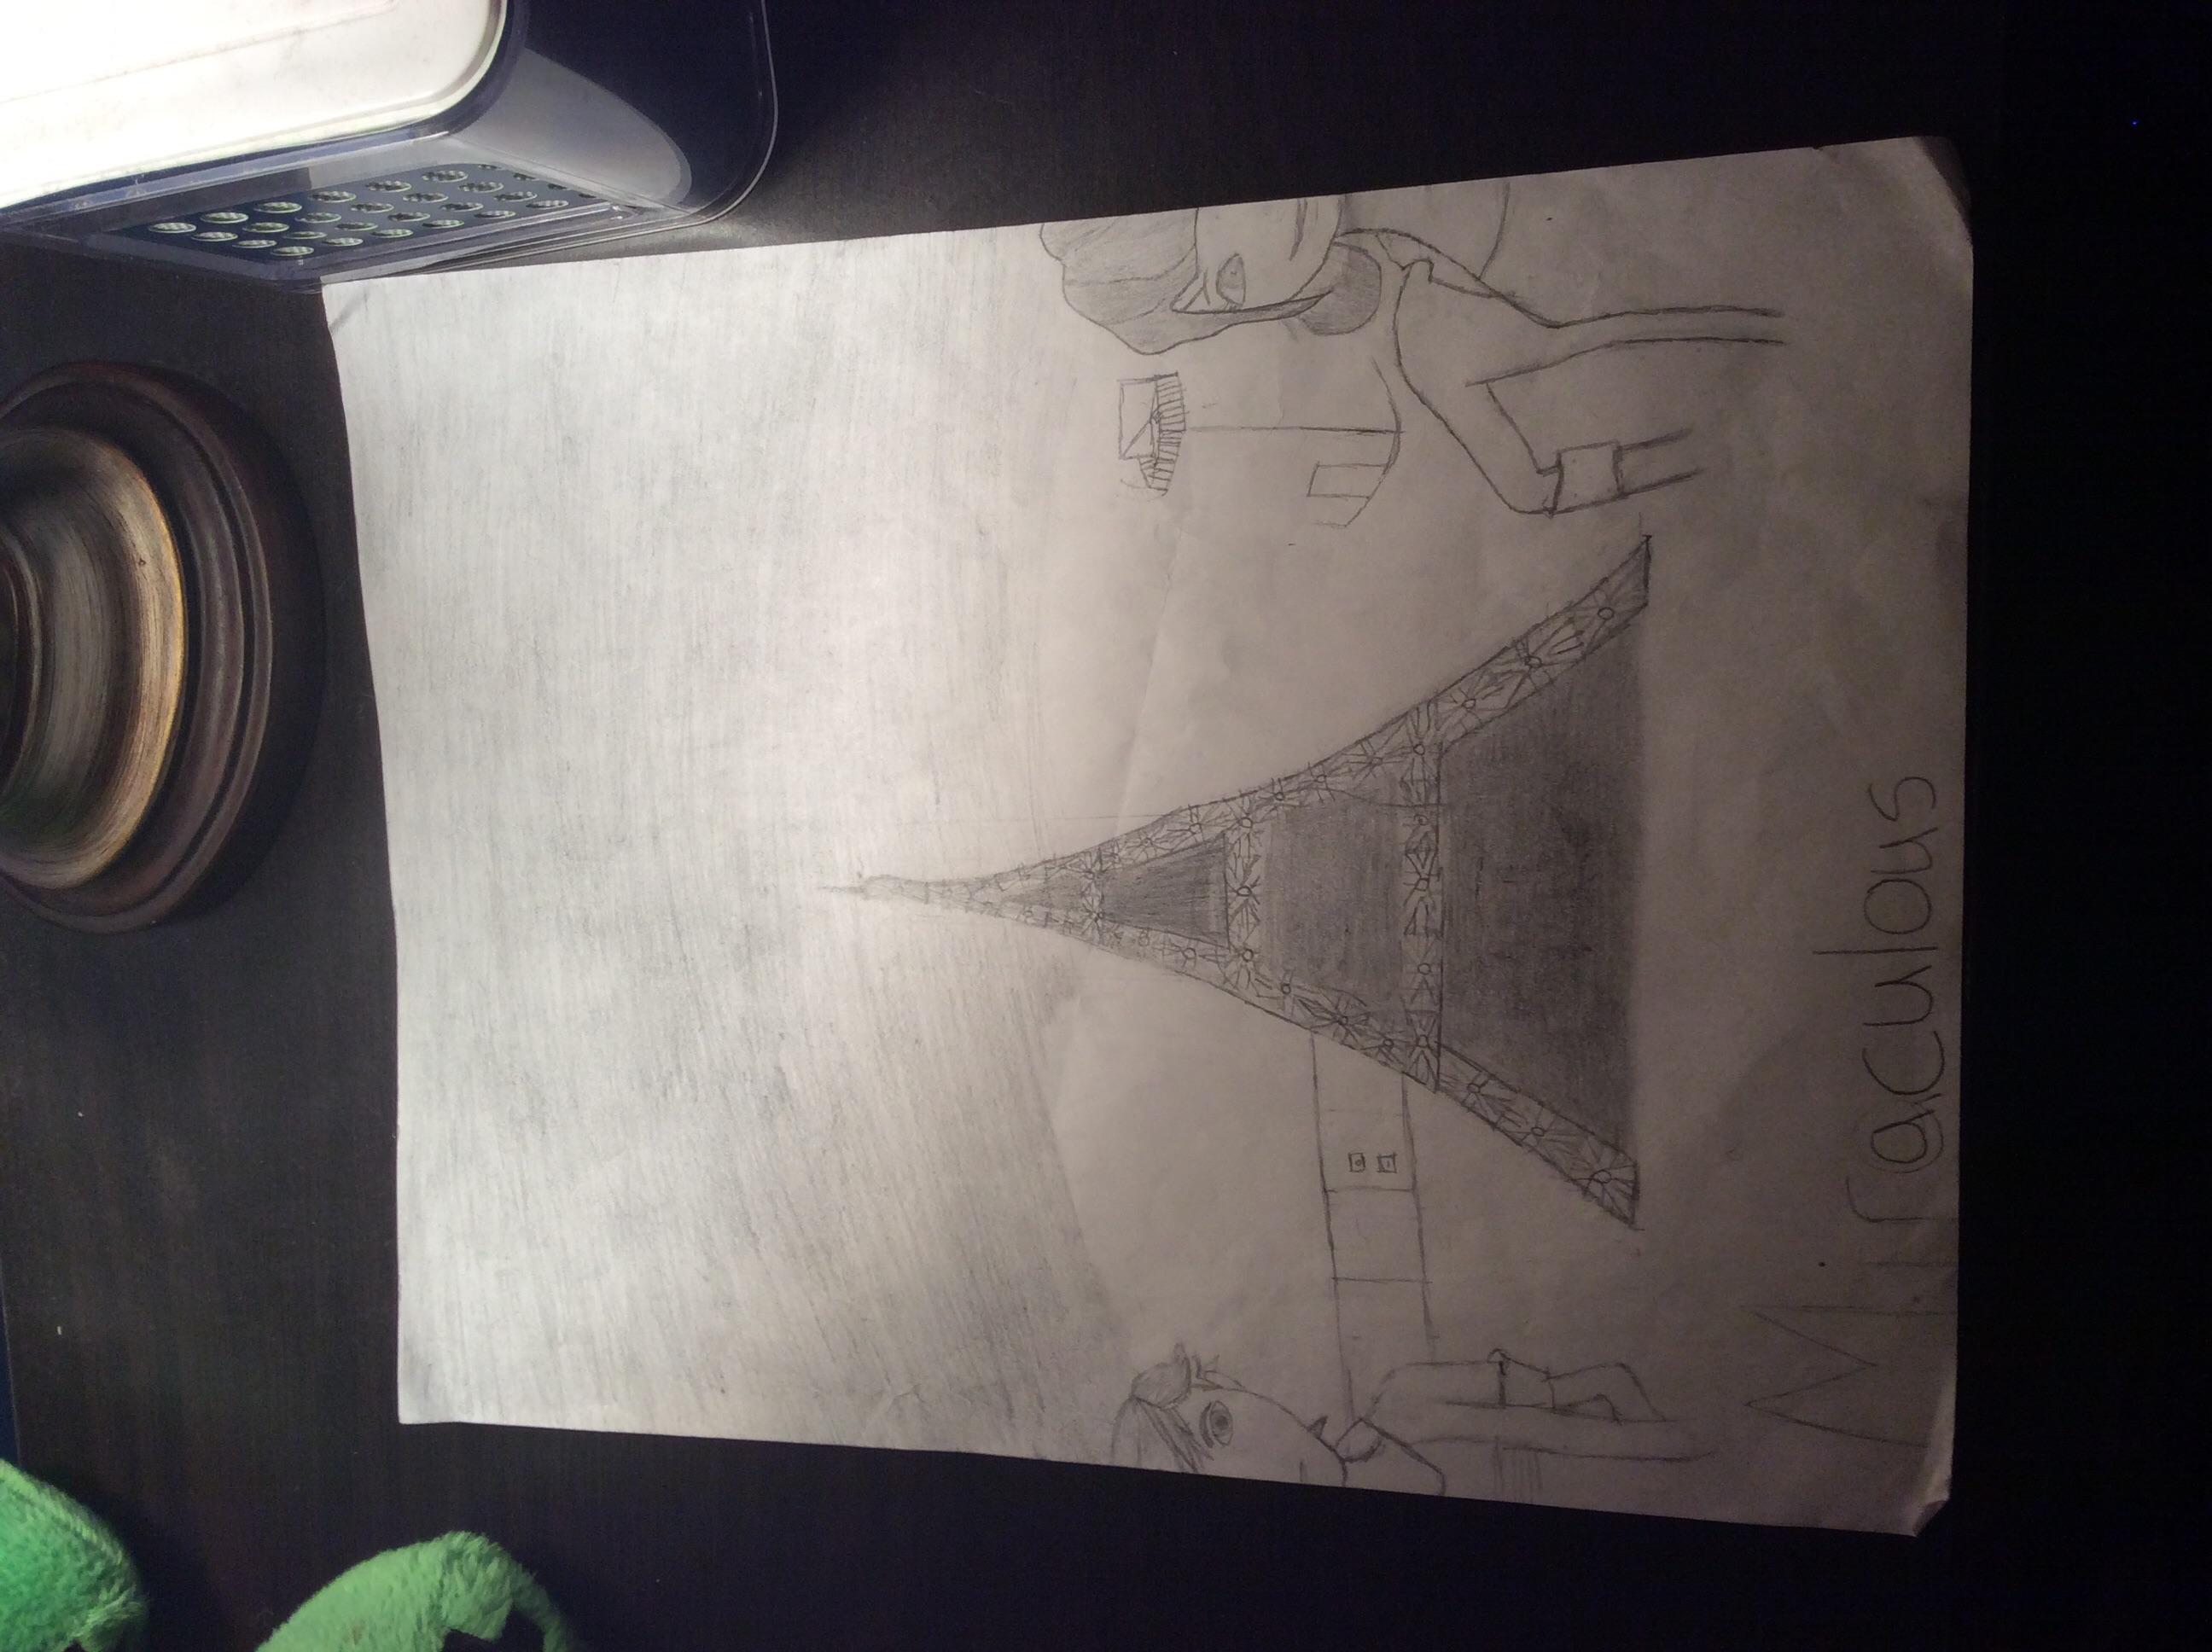 Eiffel Tower Adrienette (Update)